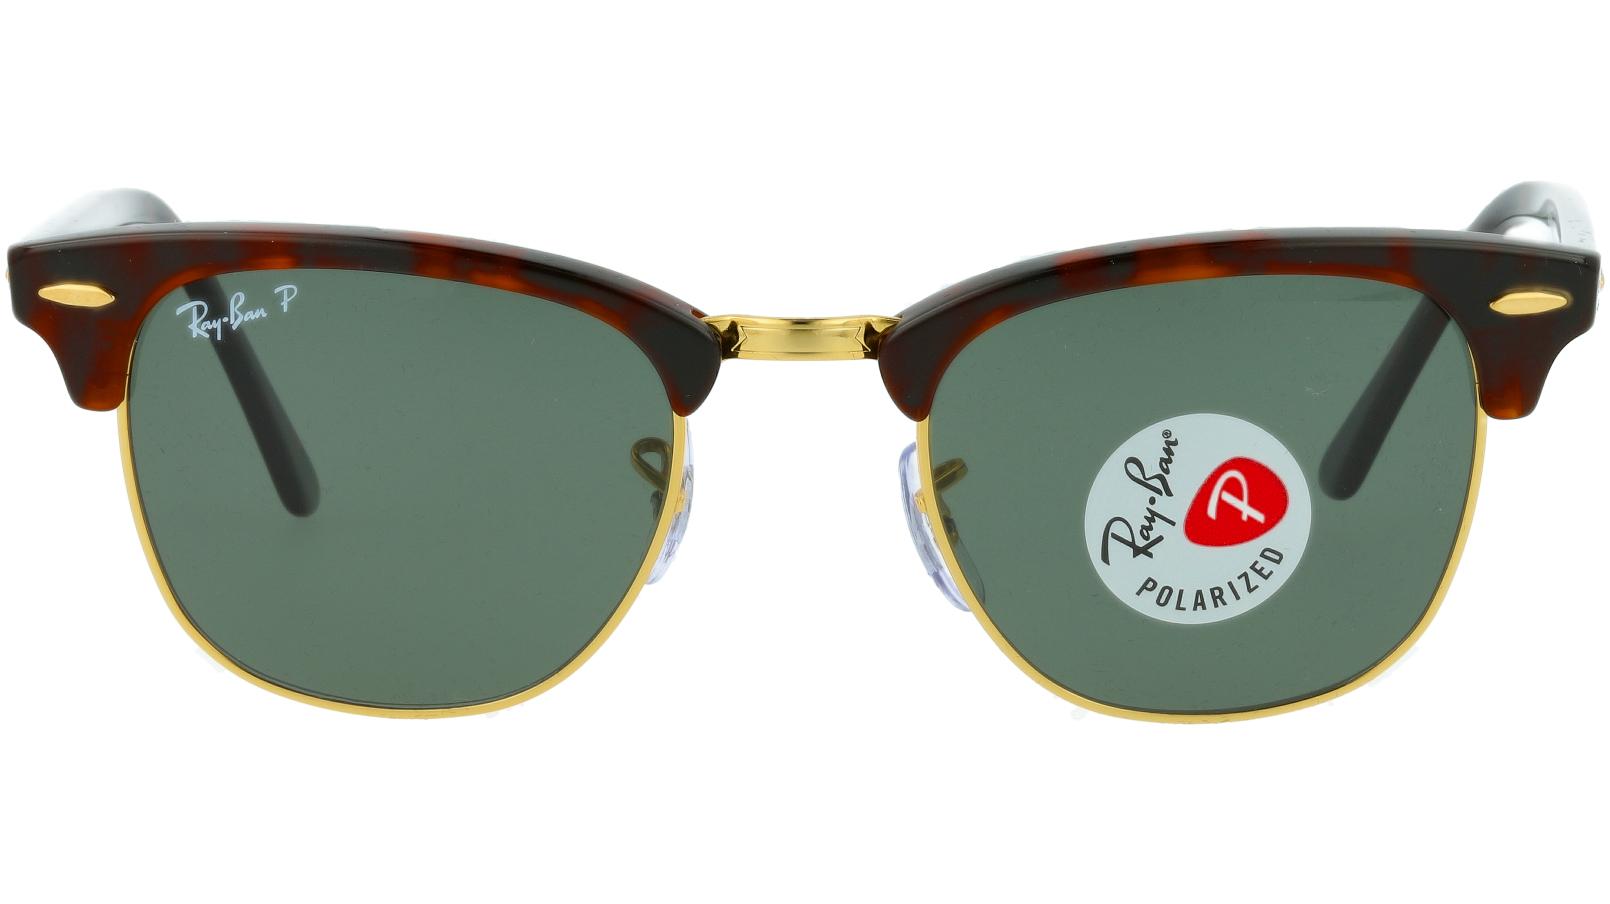 Ray-Ban RB3016 W0365 49 BLACK Sunglasses